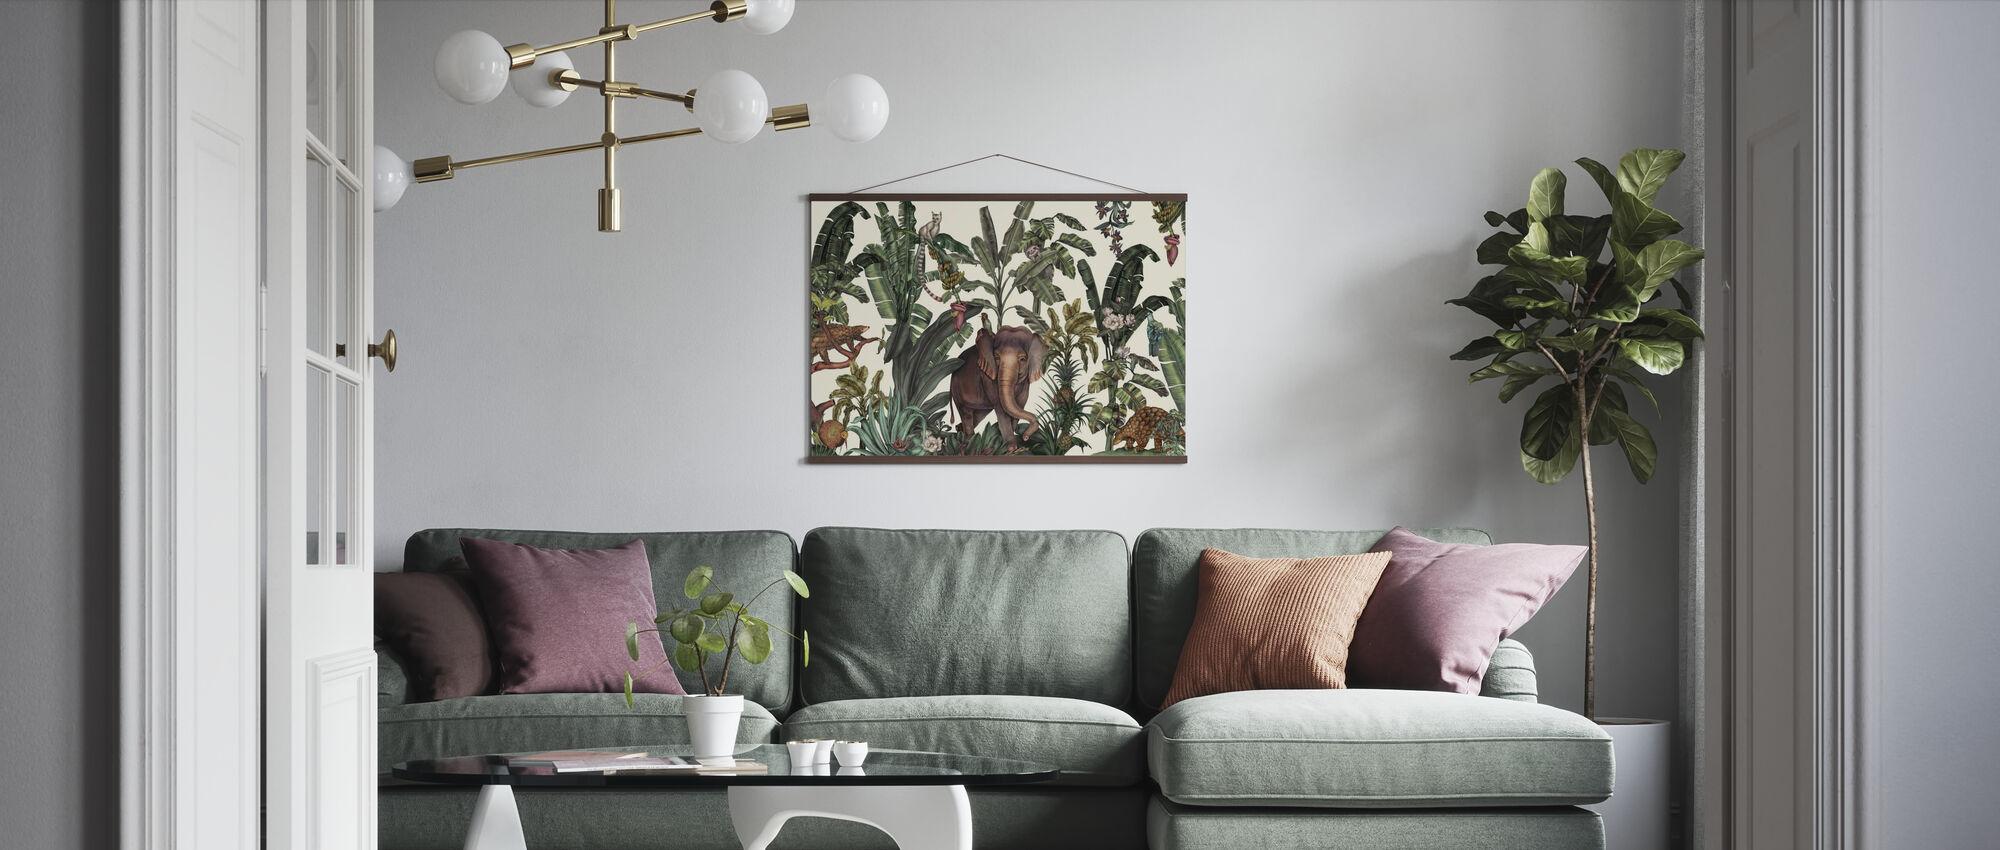 Animal Kingdom - Poster - Living Room